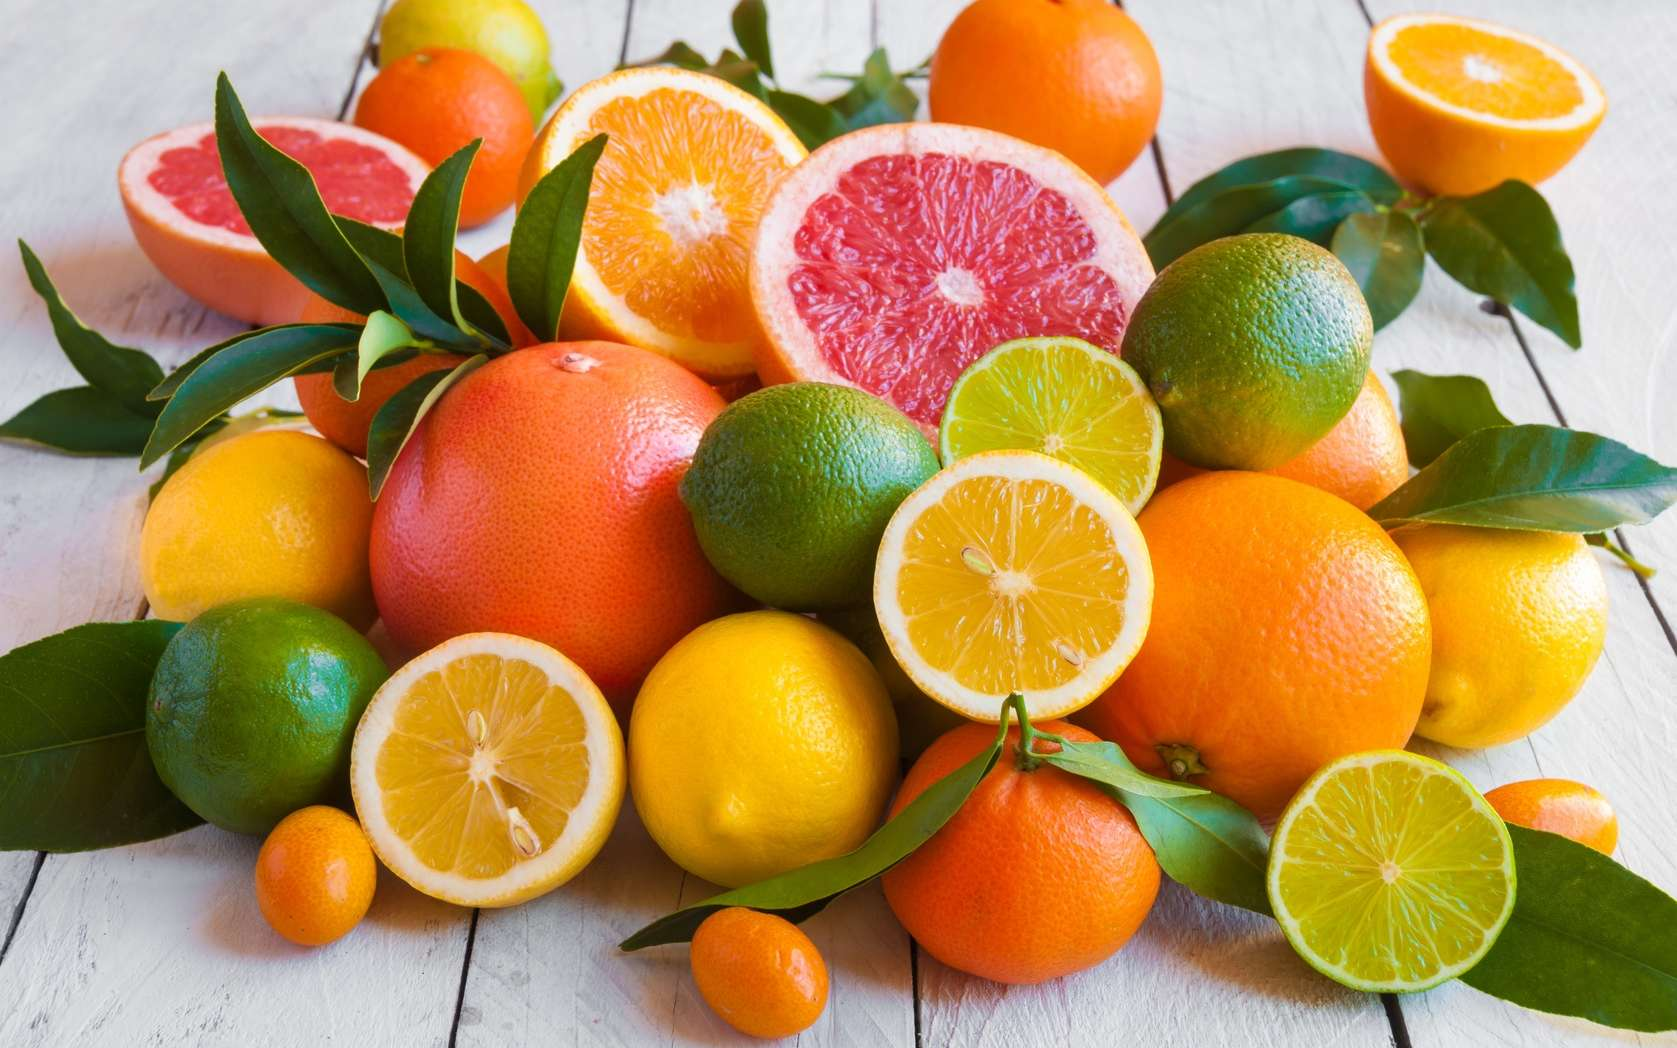 Les agrumes sont riches en vitamine C, un antioxydant. © Maresol, Fotolia